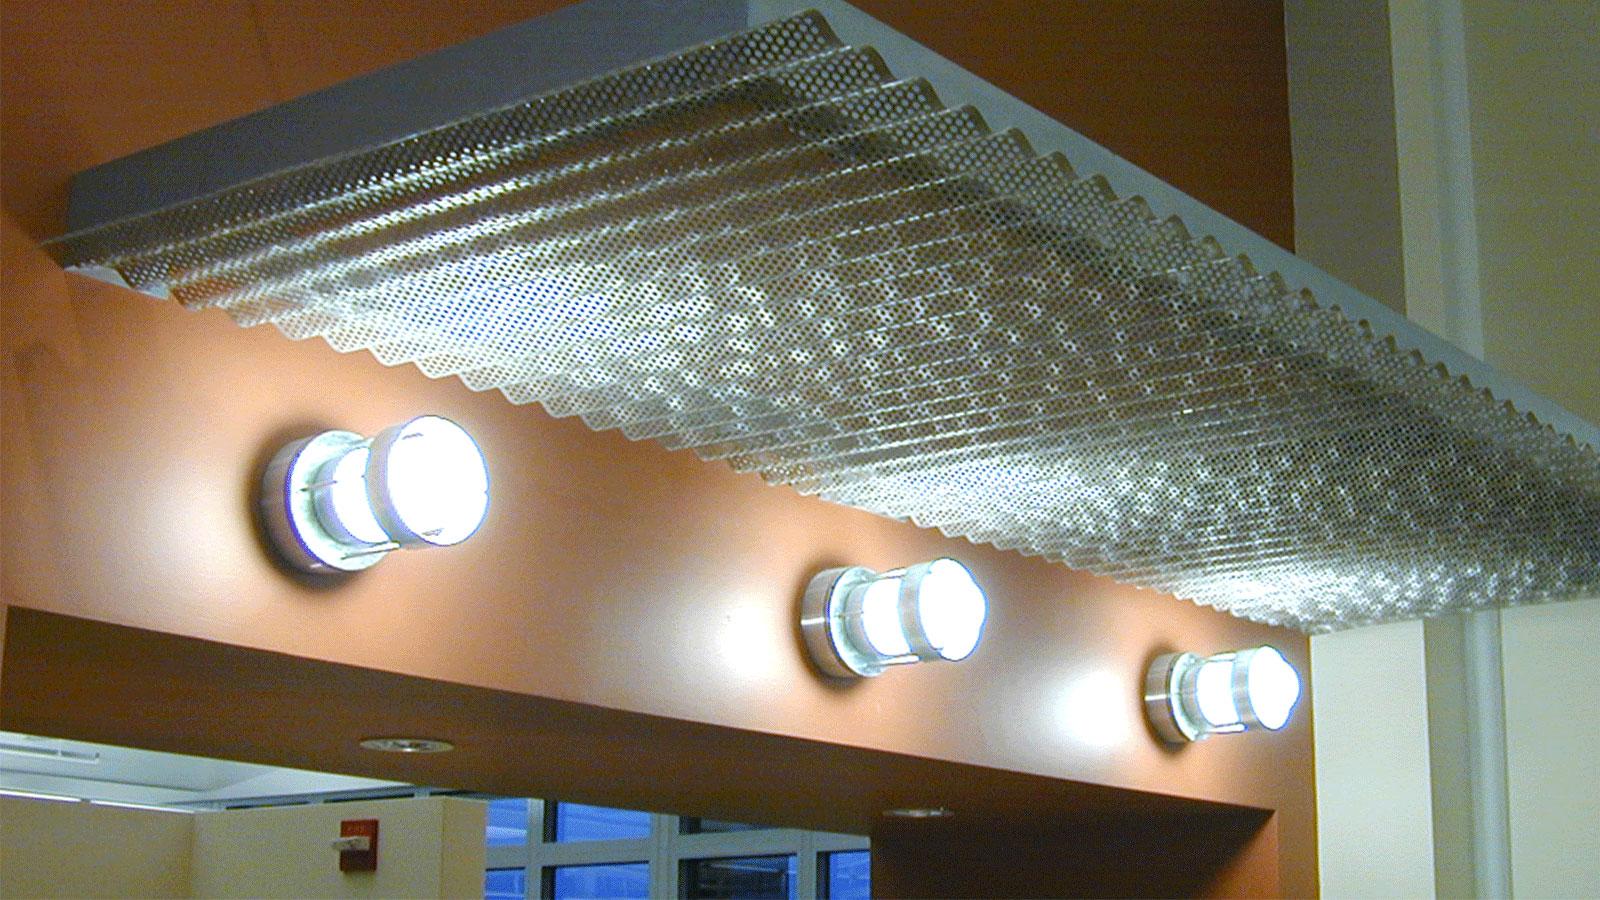 Moz Designer Metals, Ceiling Applications, Canopy Applications